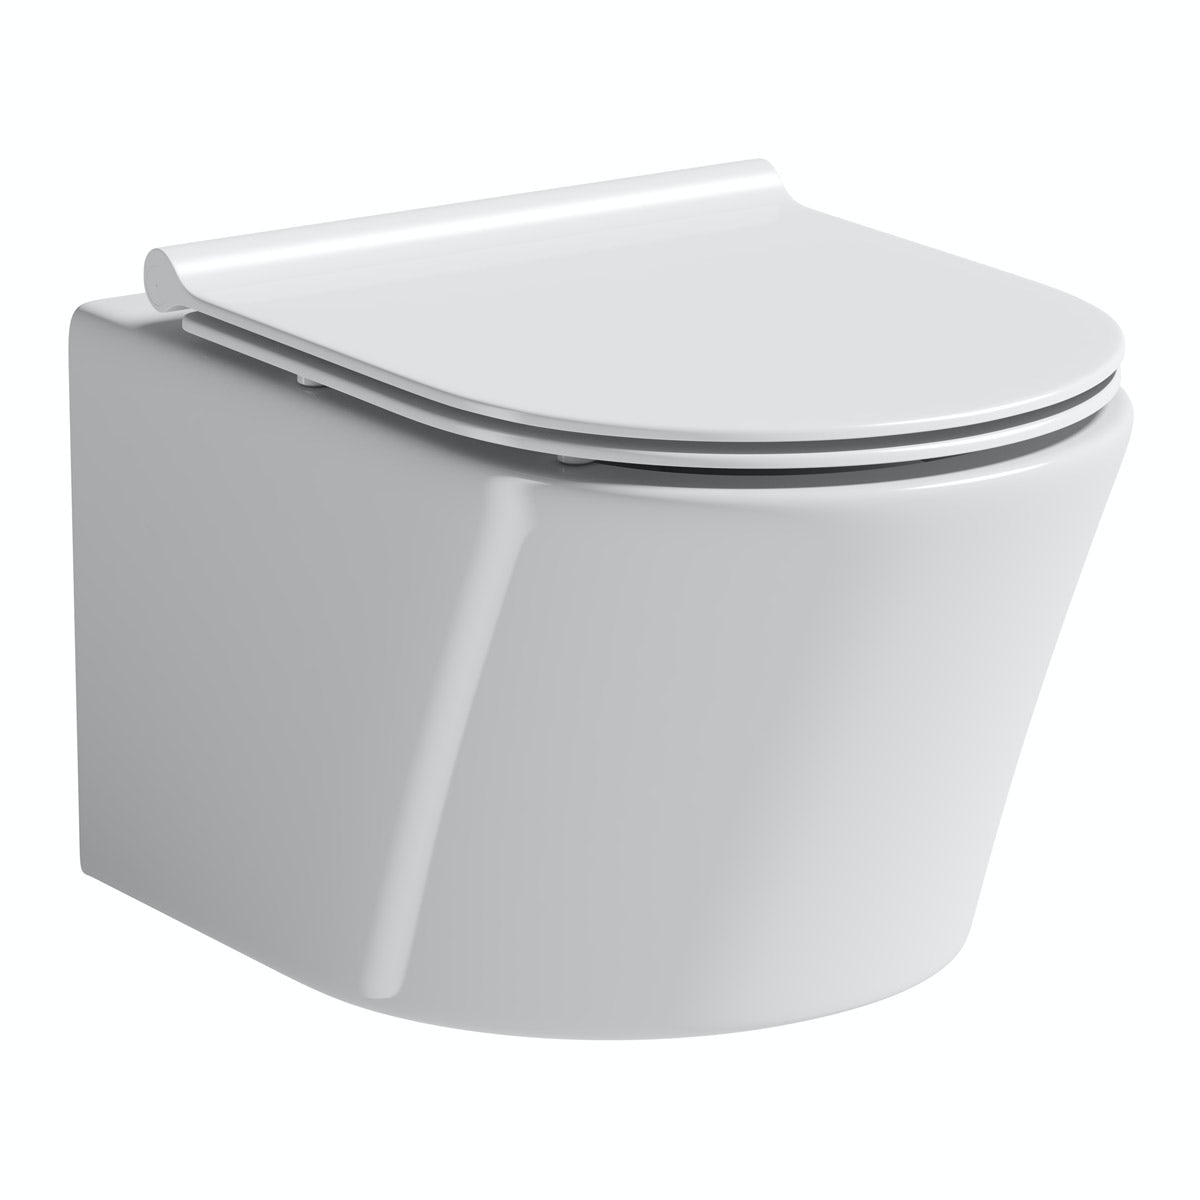 Mode Arte wall hung toilet inc slimline soft close toilet seat